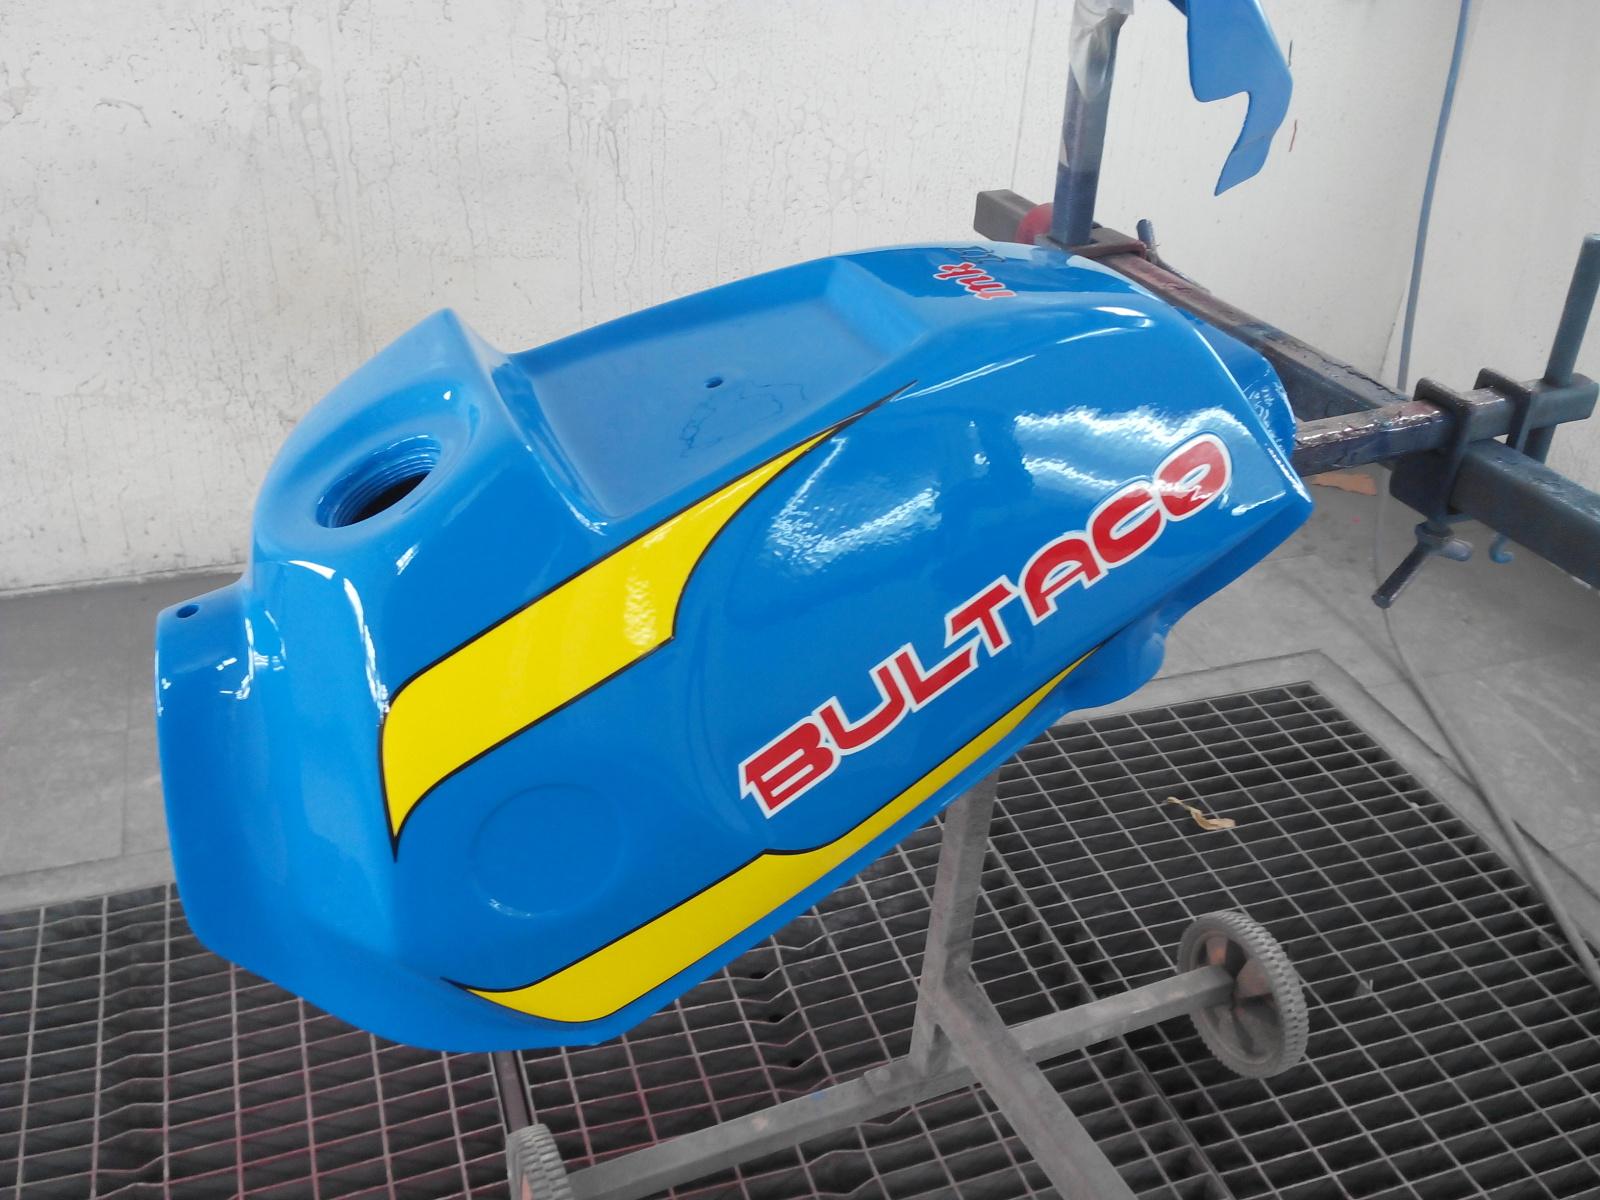 Bultaco MK11 370 - Motor - Página 2 25u1bfm